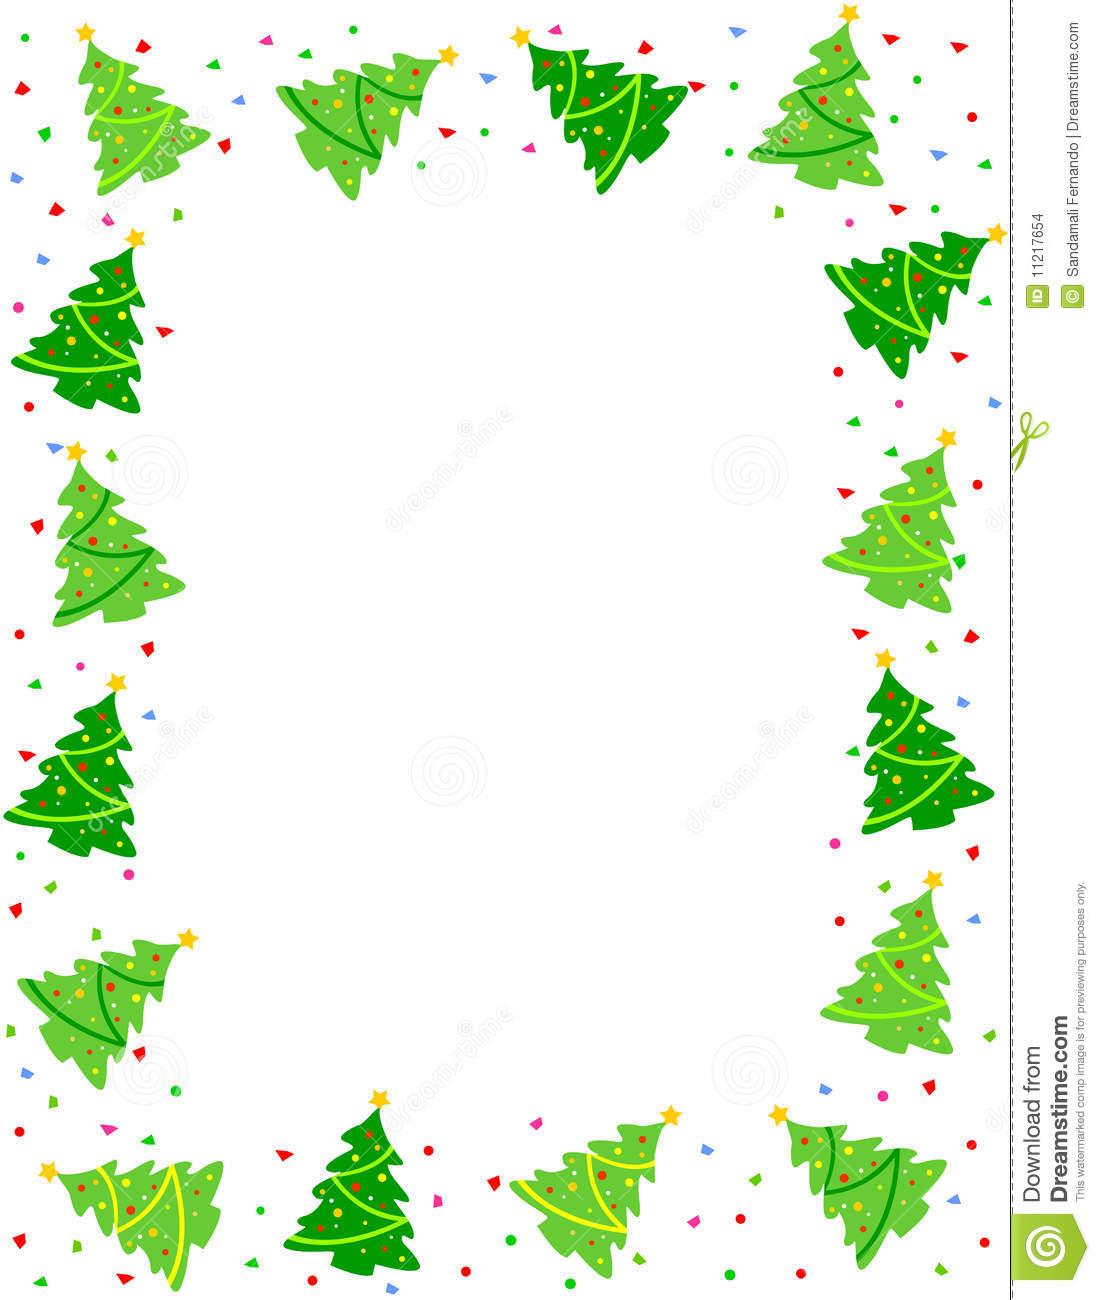 Clip Art Christmas Clipart Borders chris-Clip Art Christmas Clipart Borders christmas clipart borders clip art images border art-11